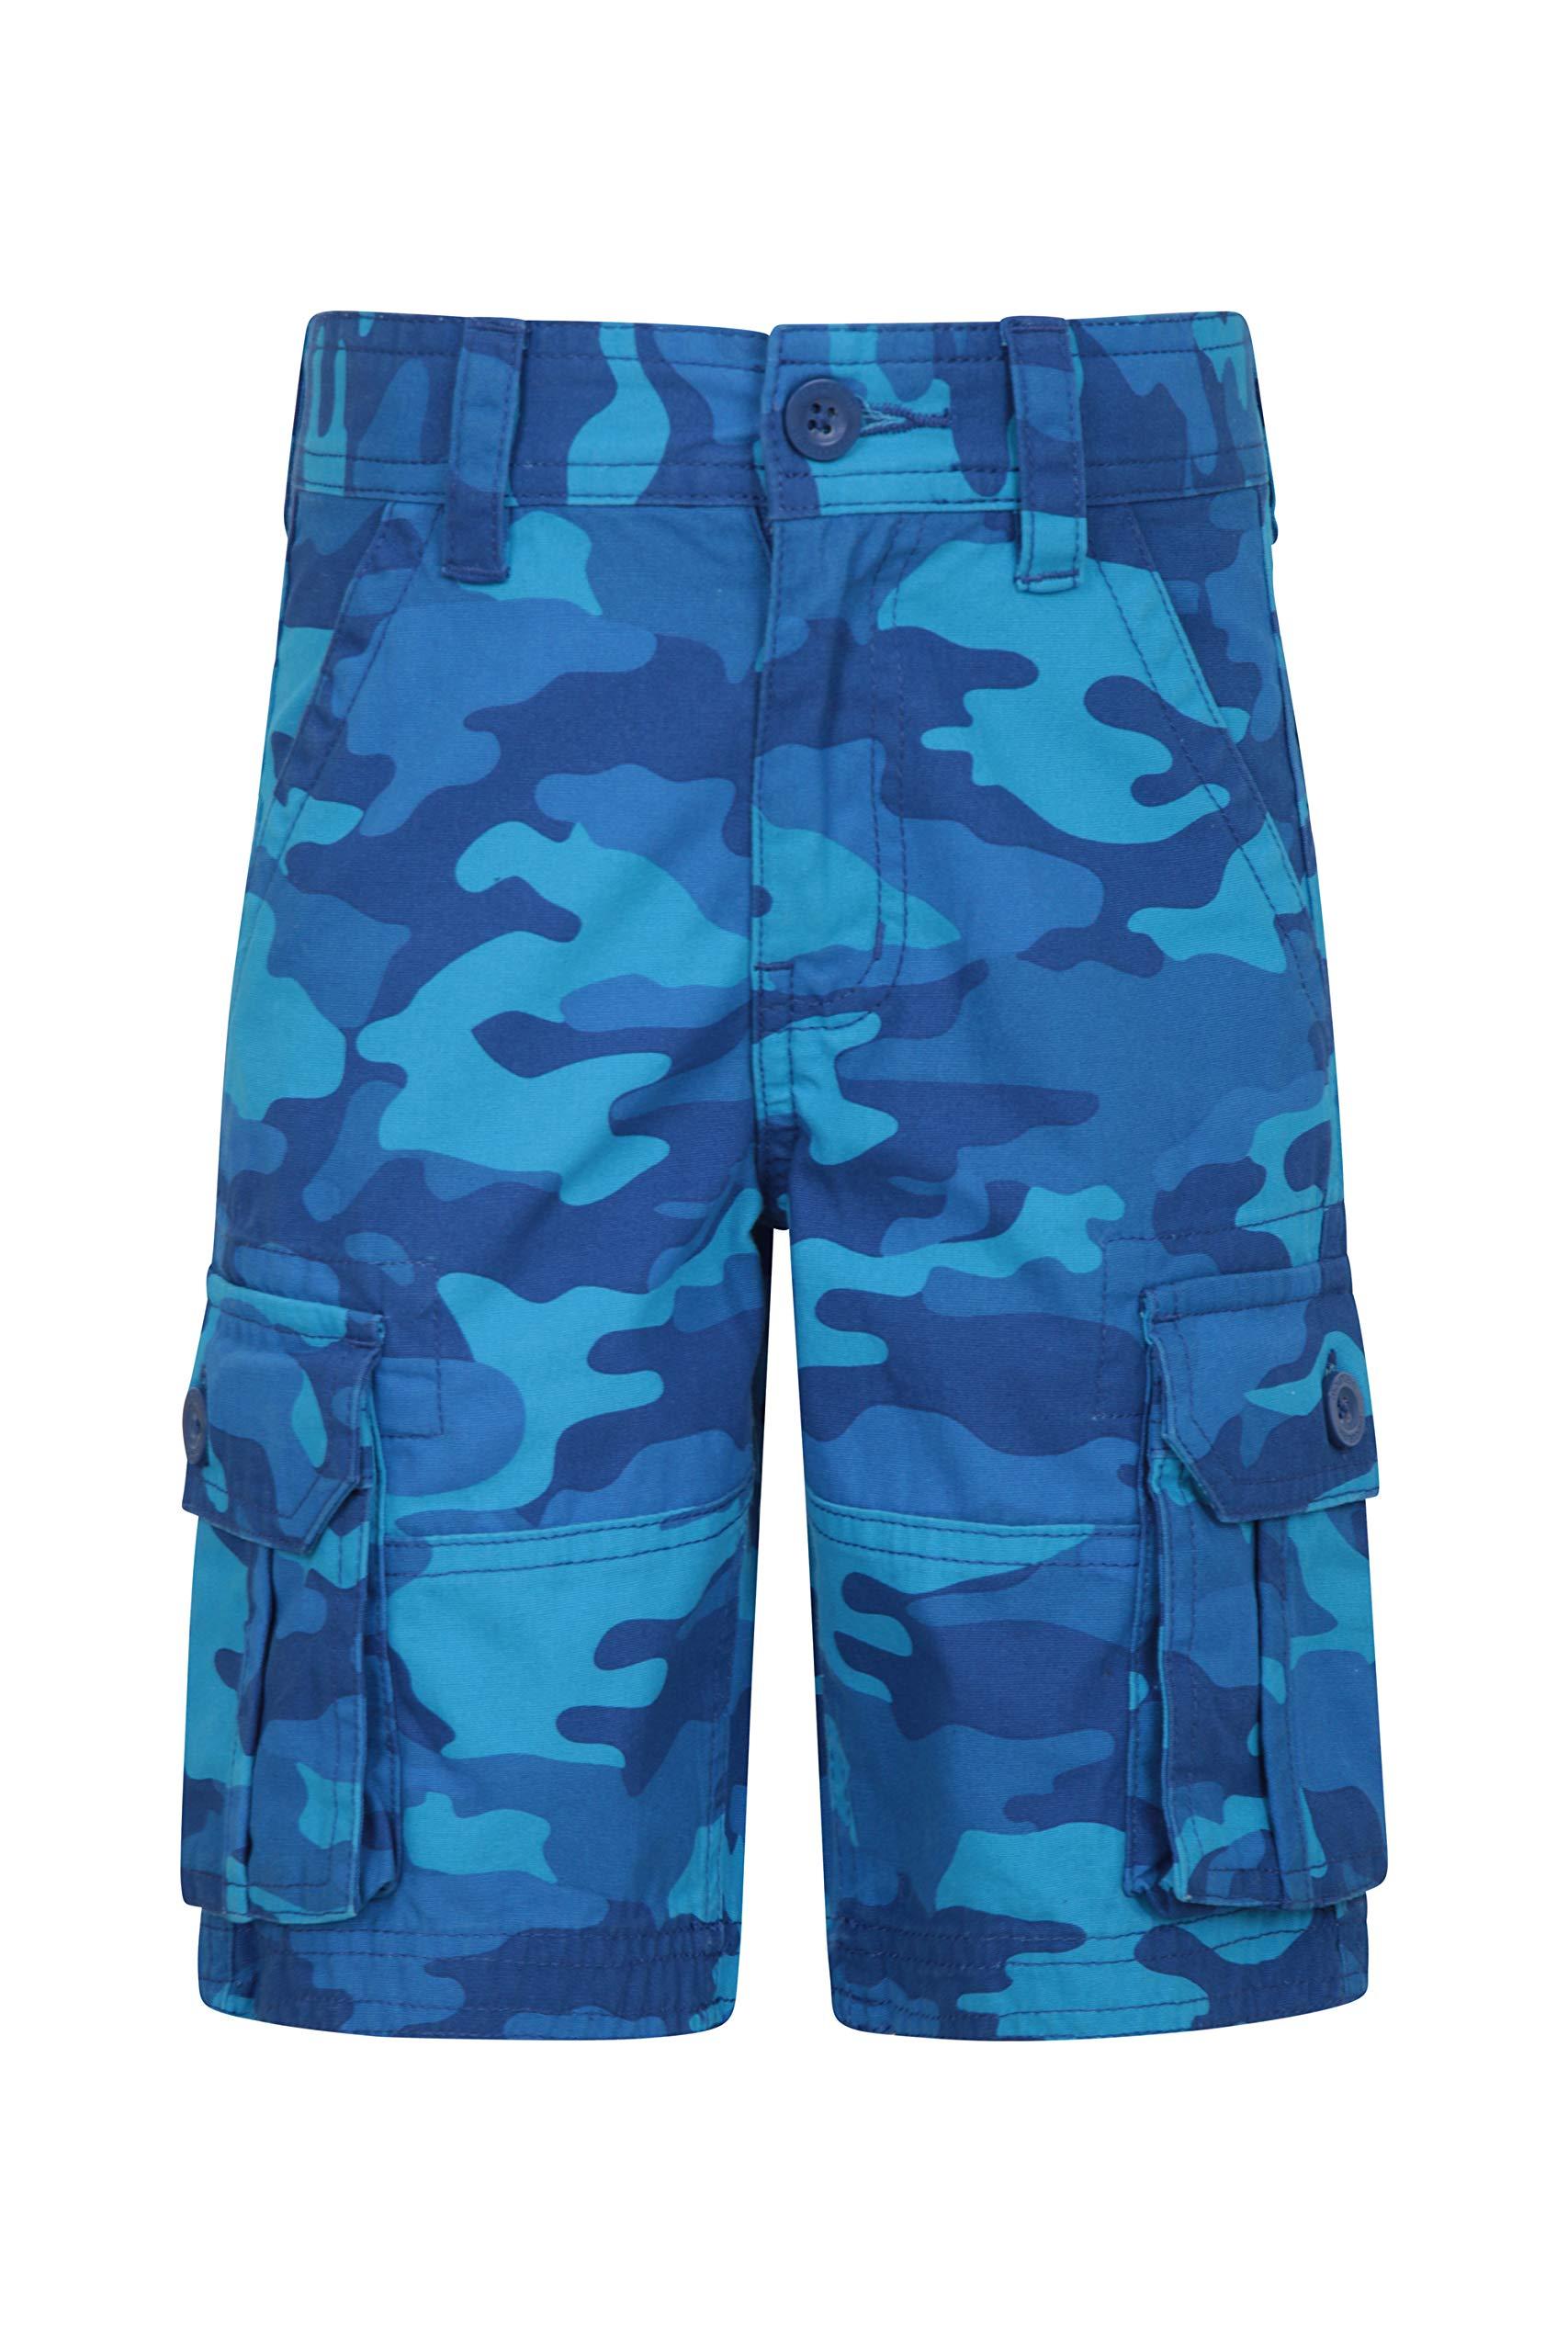 Mountain Warehouse Kids Camo Cargo Shorts - 100% Cotton Summer Pants Blue 11-12 Years by Mountain Warehouse